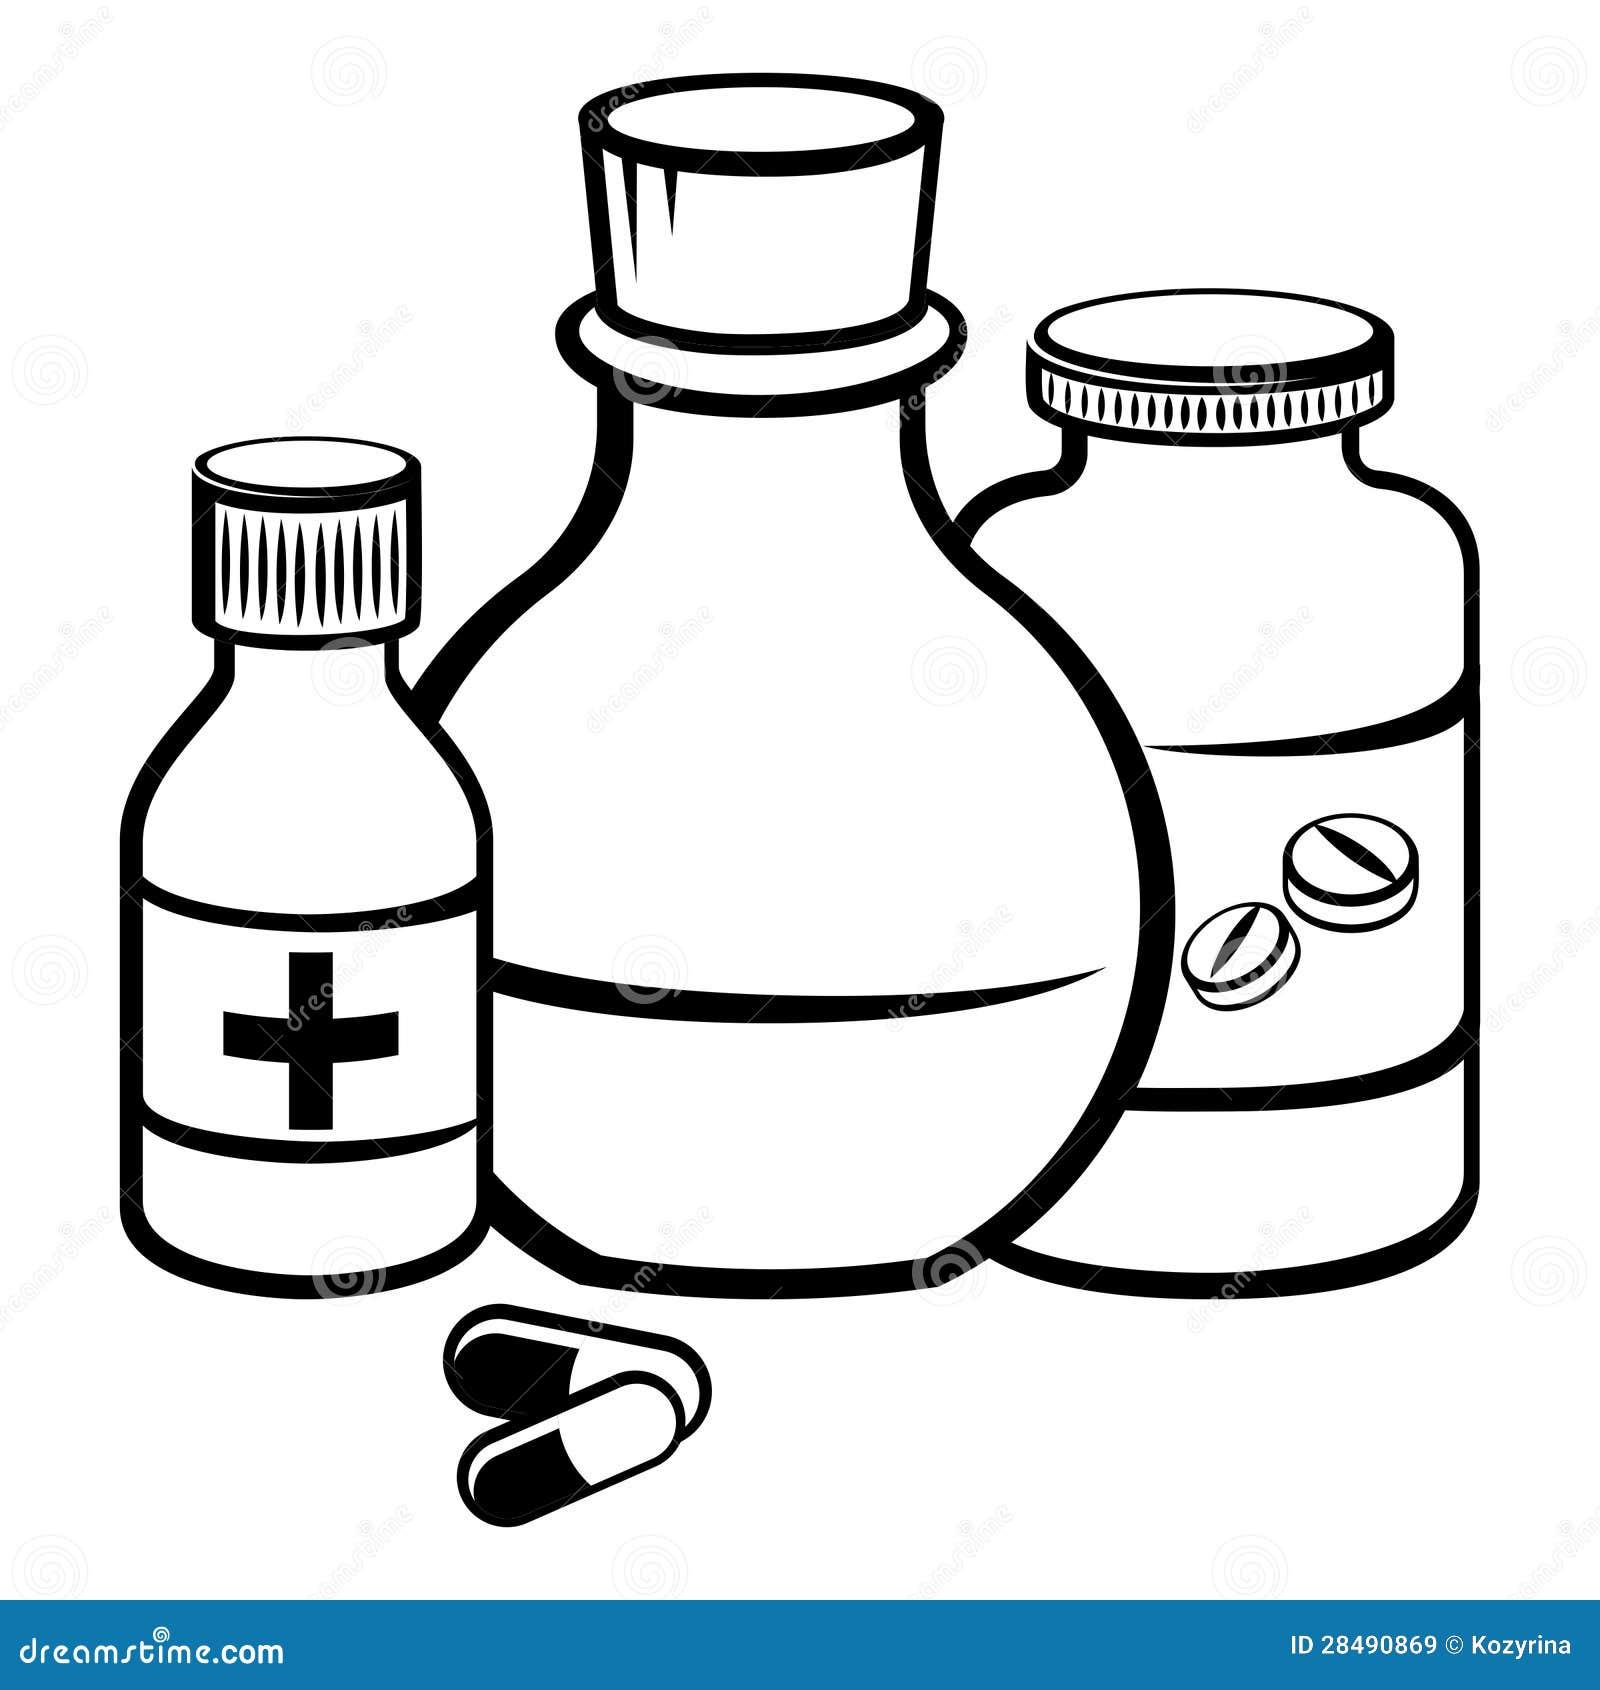 coloring pages medicine bottle - photo#7